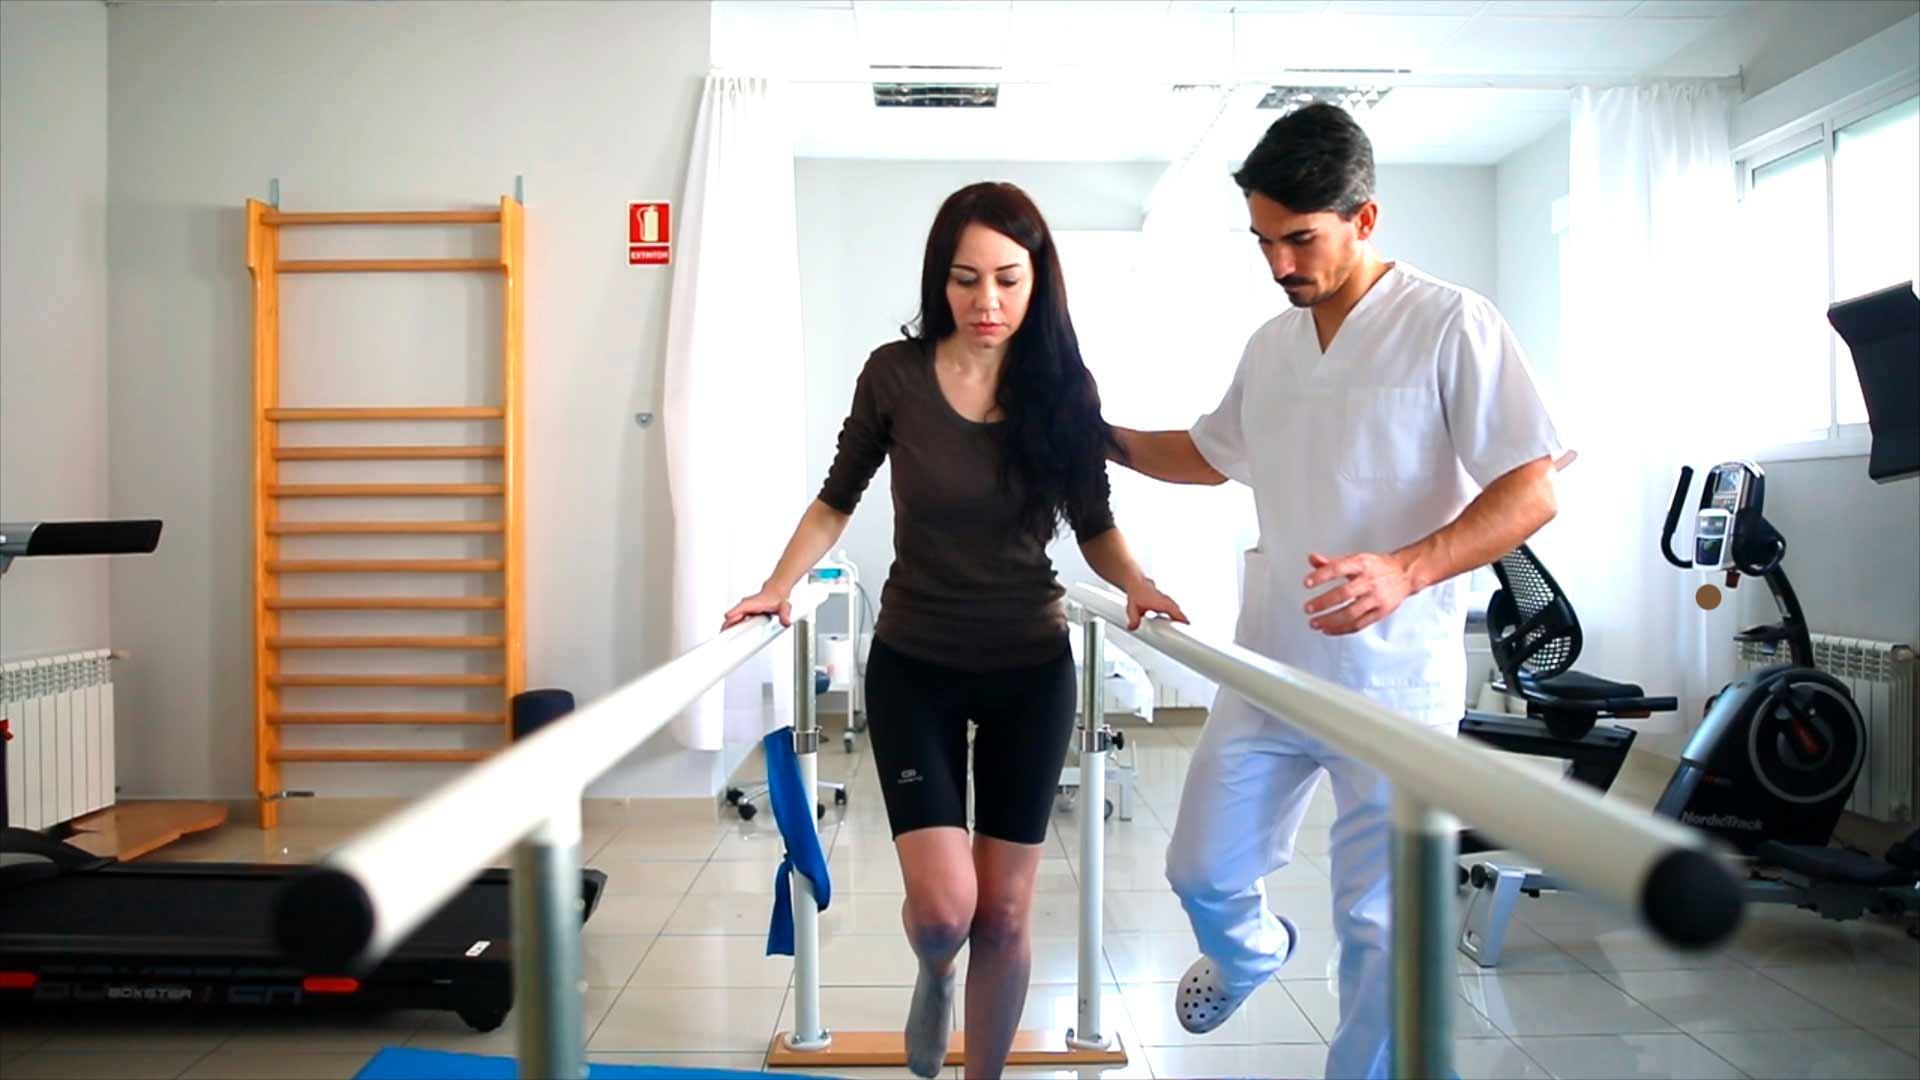 rehabilitacion y traumatología madrid